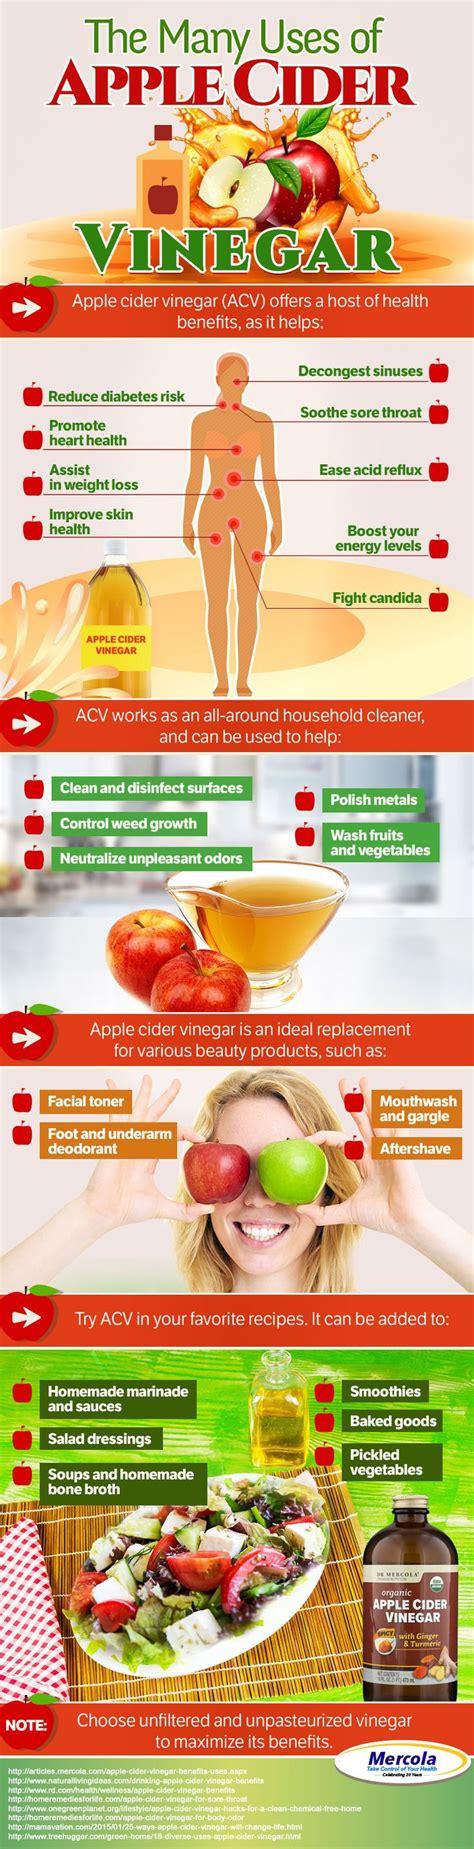 Apple Cider Vinegar Tonic 60 Detox Meth by Best 25 Apple Cider Vinegar Benefits Ideas On